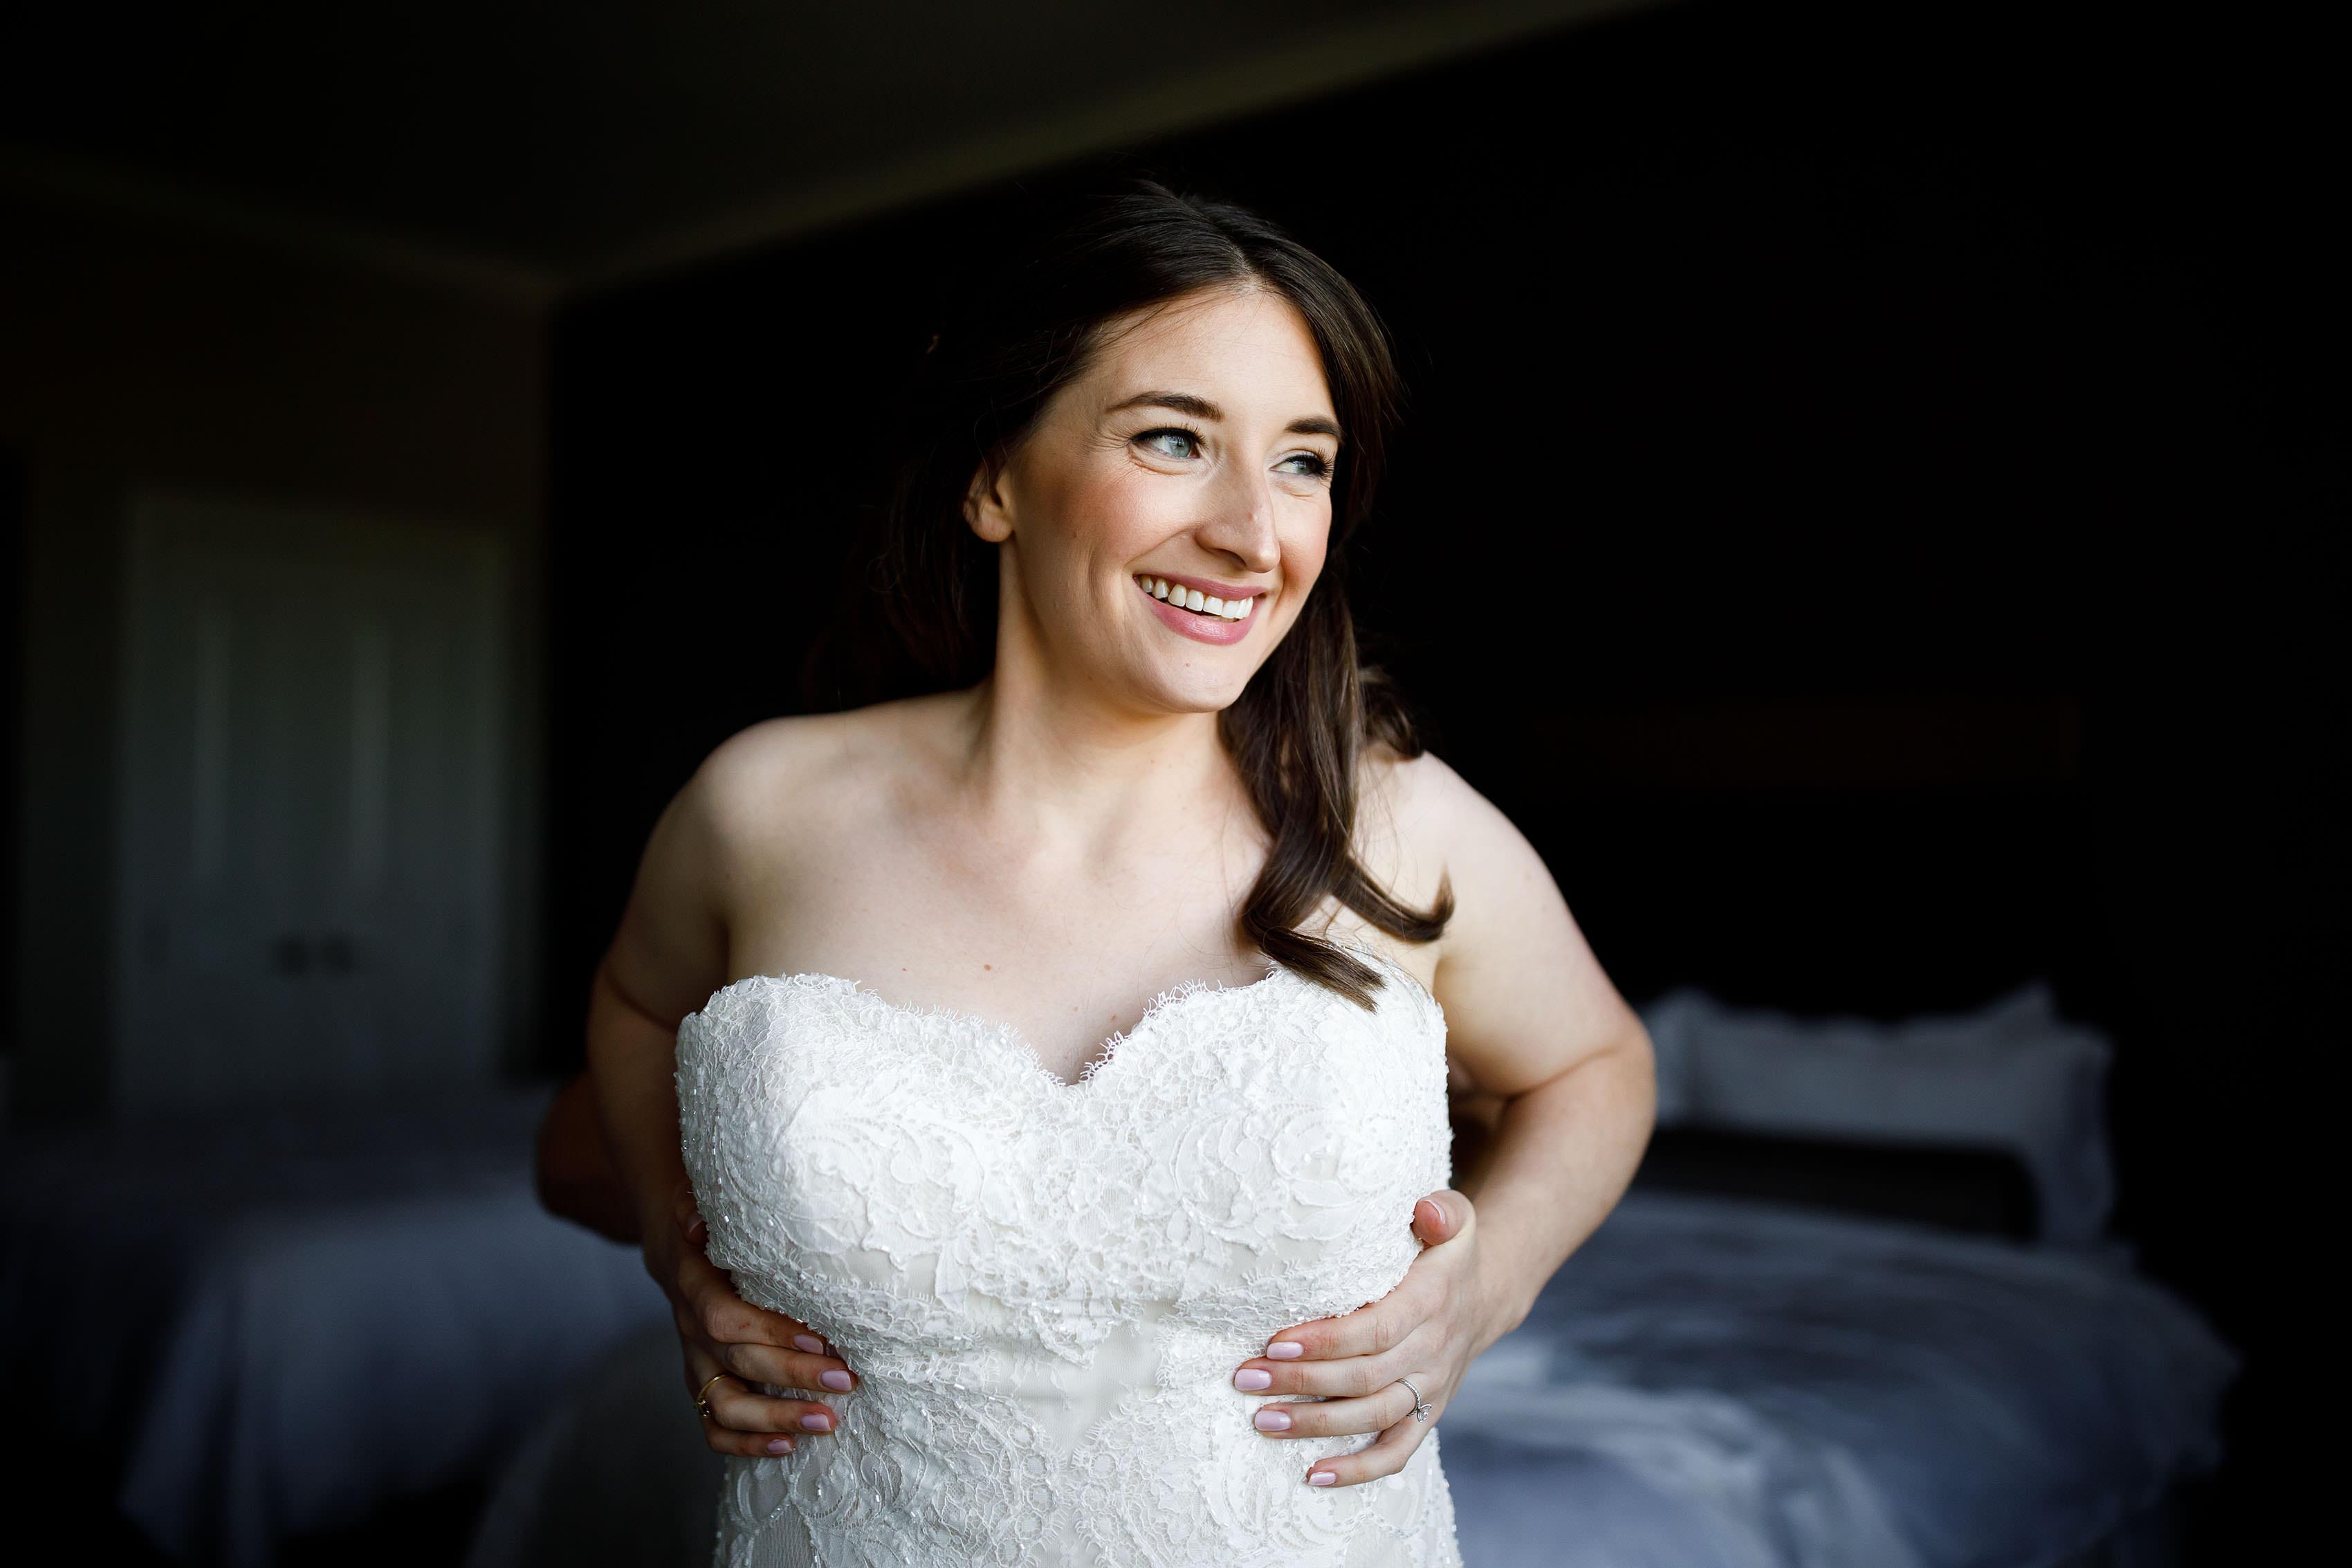 Katie puts on her gown